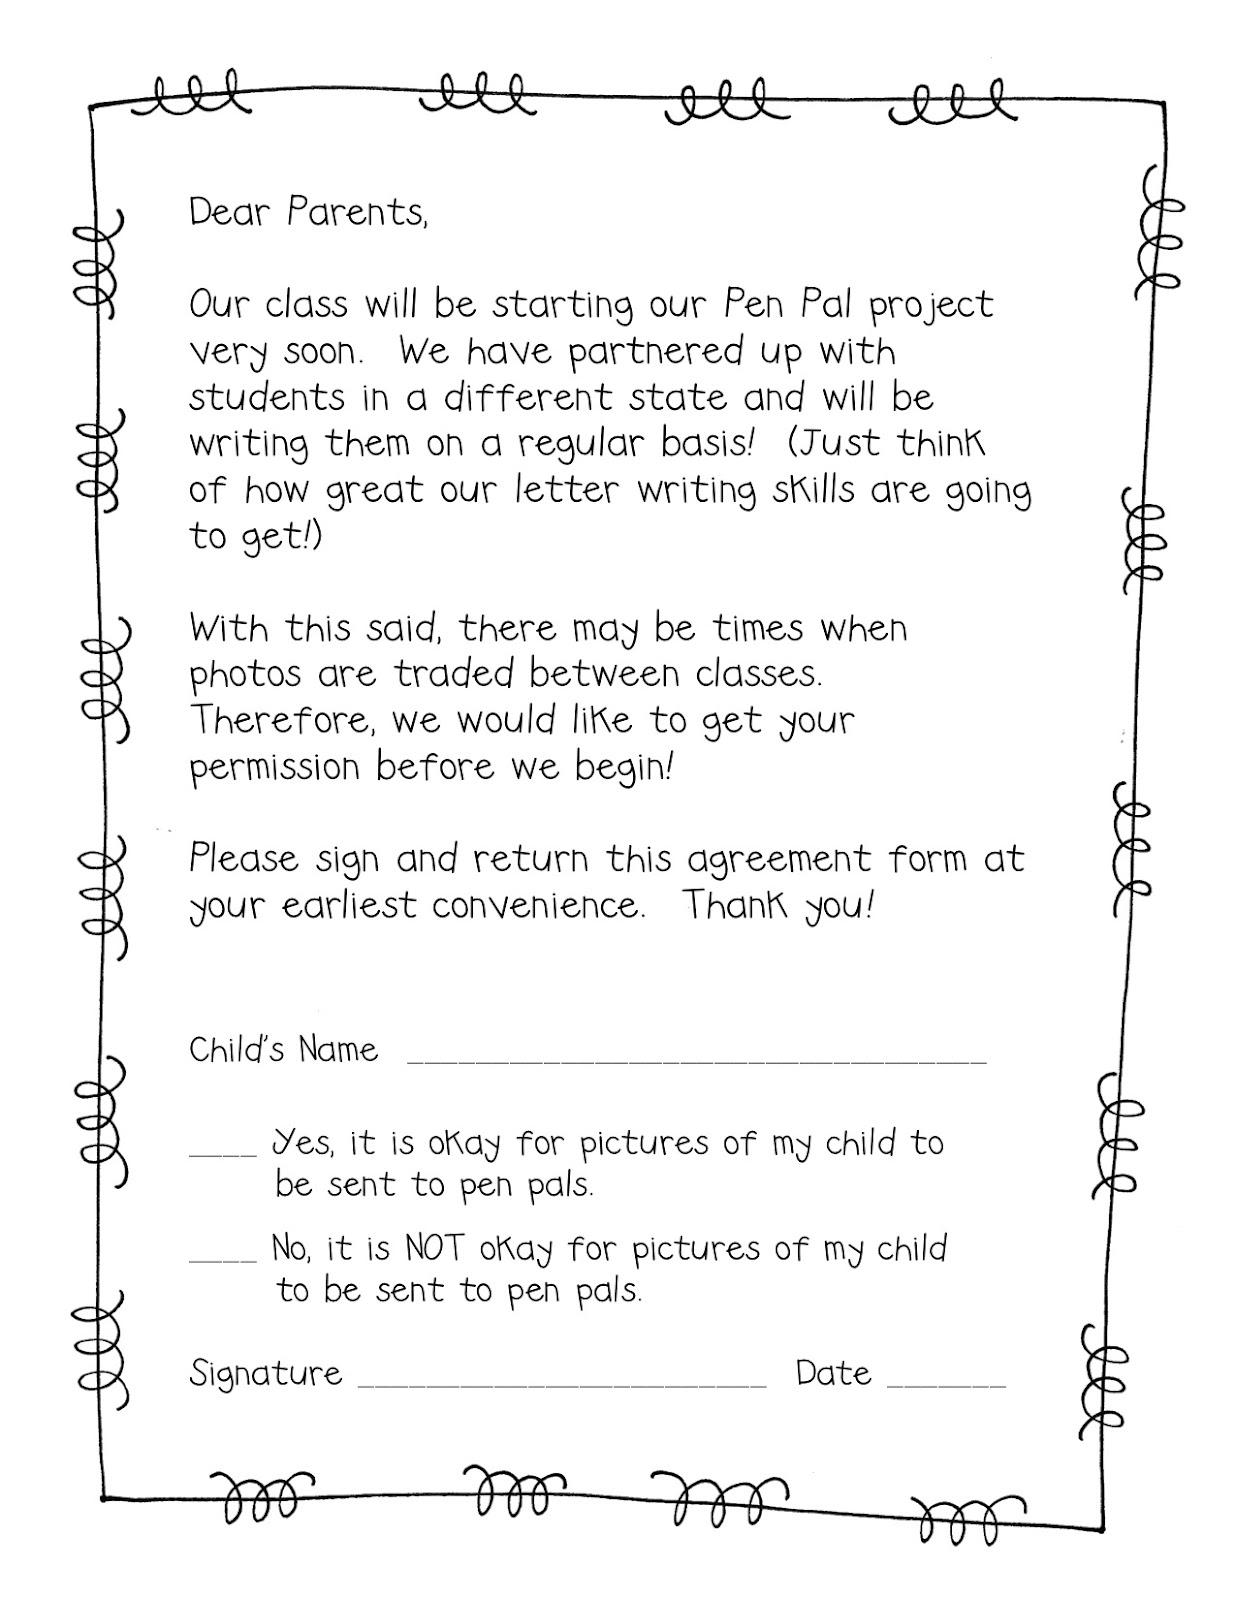 Poughkeepsie Day School | Common App Essay Prompts